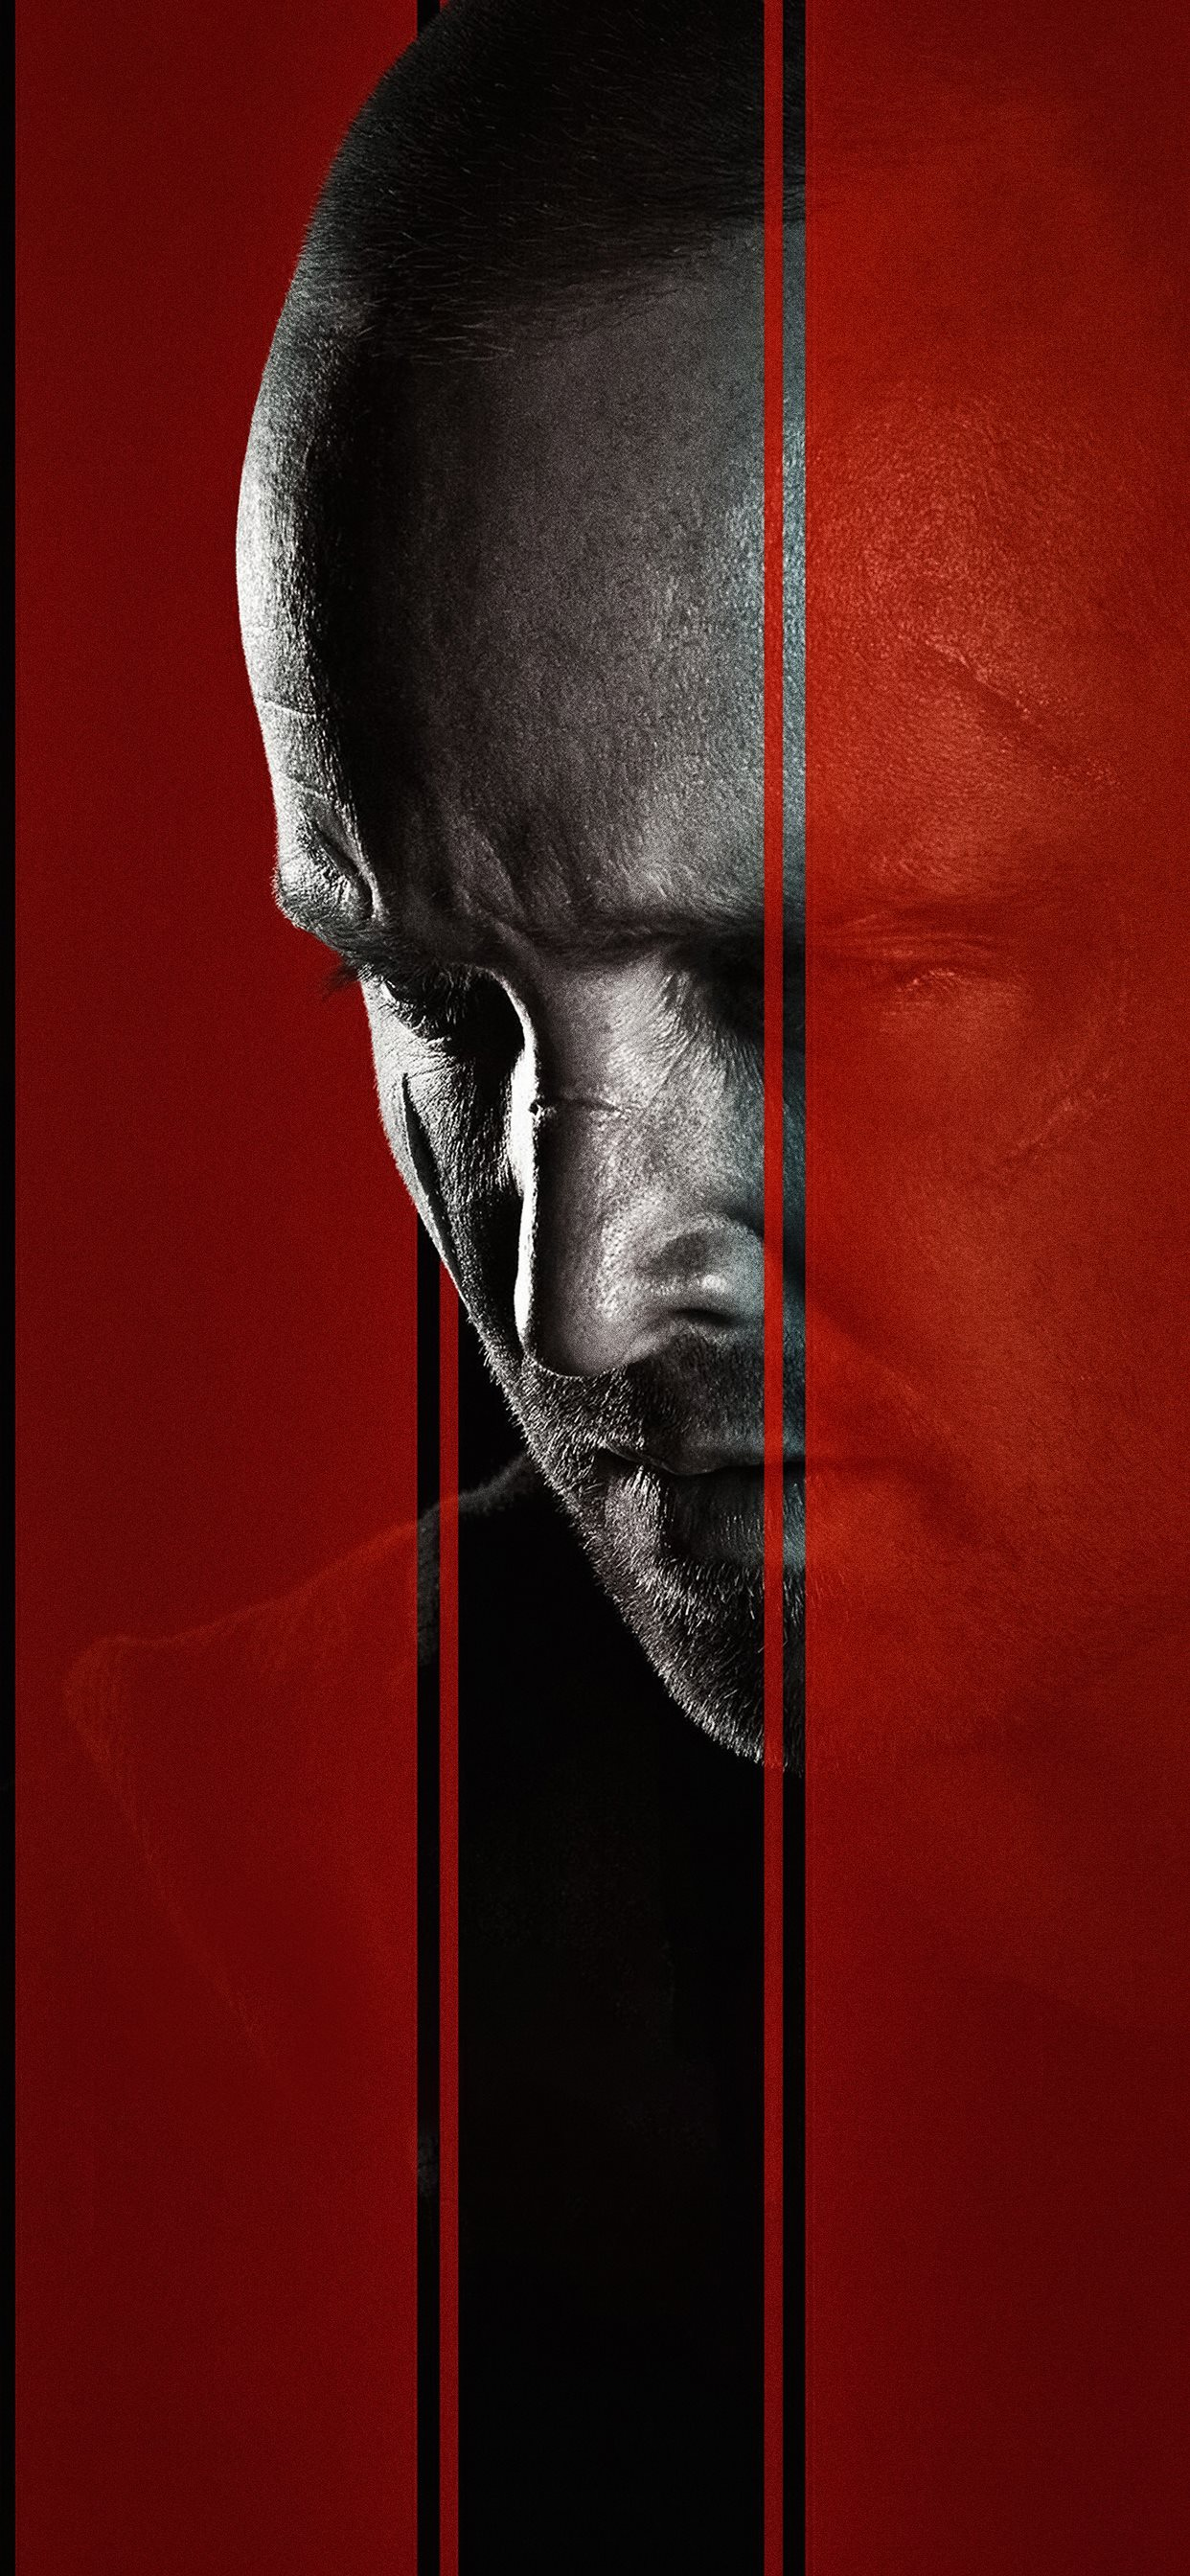 El Camino Breaking Bad Movie 2019 Netflix 4k Iphone